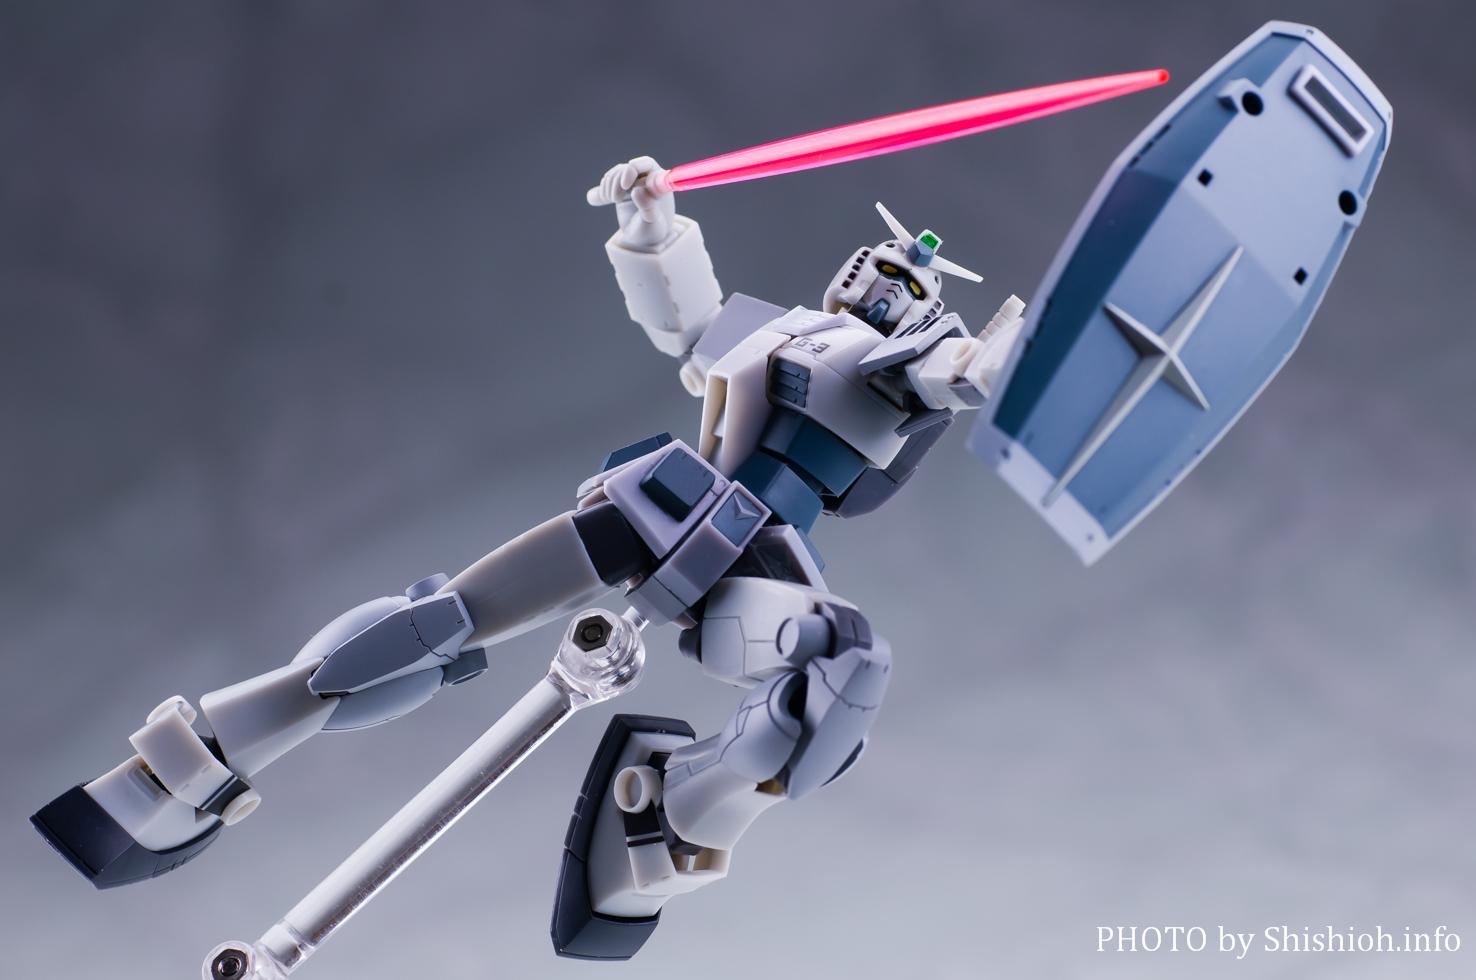 ROBOT魂〈SIDE MS〉RX-78-3 G-3 ガンダム ver. A.N.I.M.E.